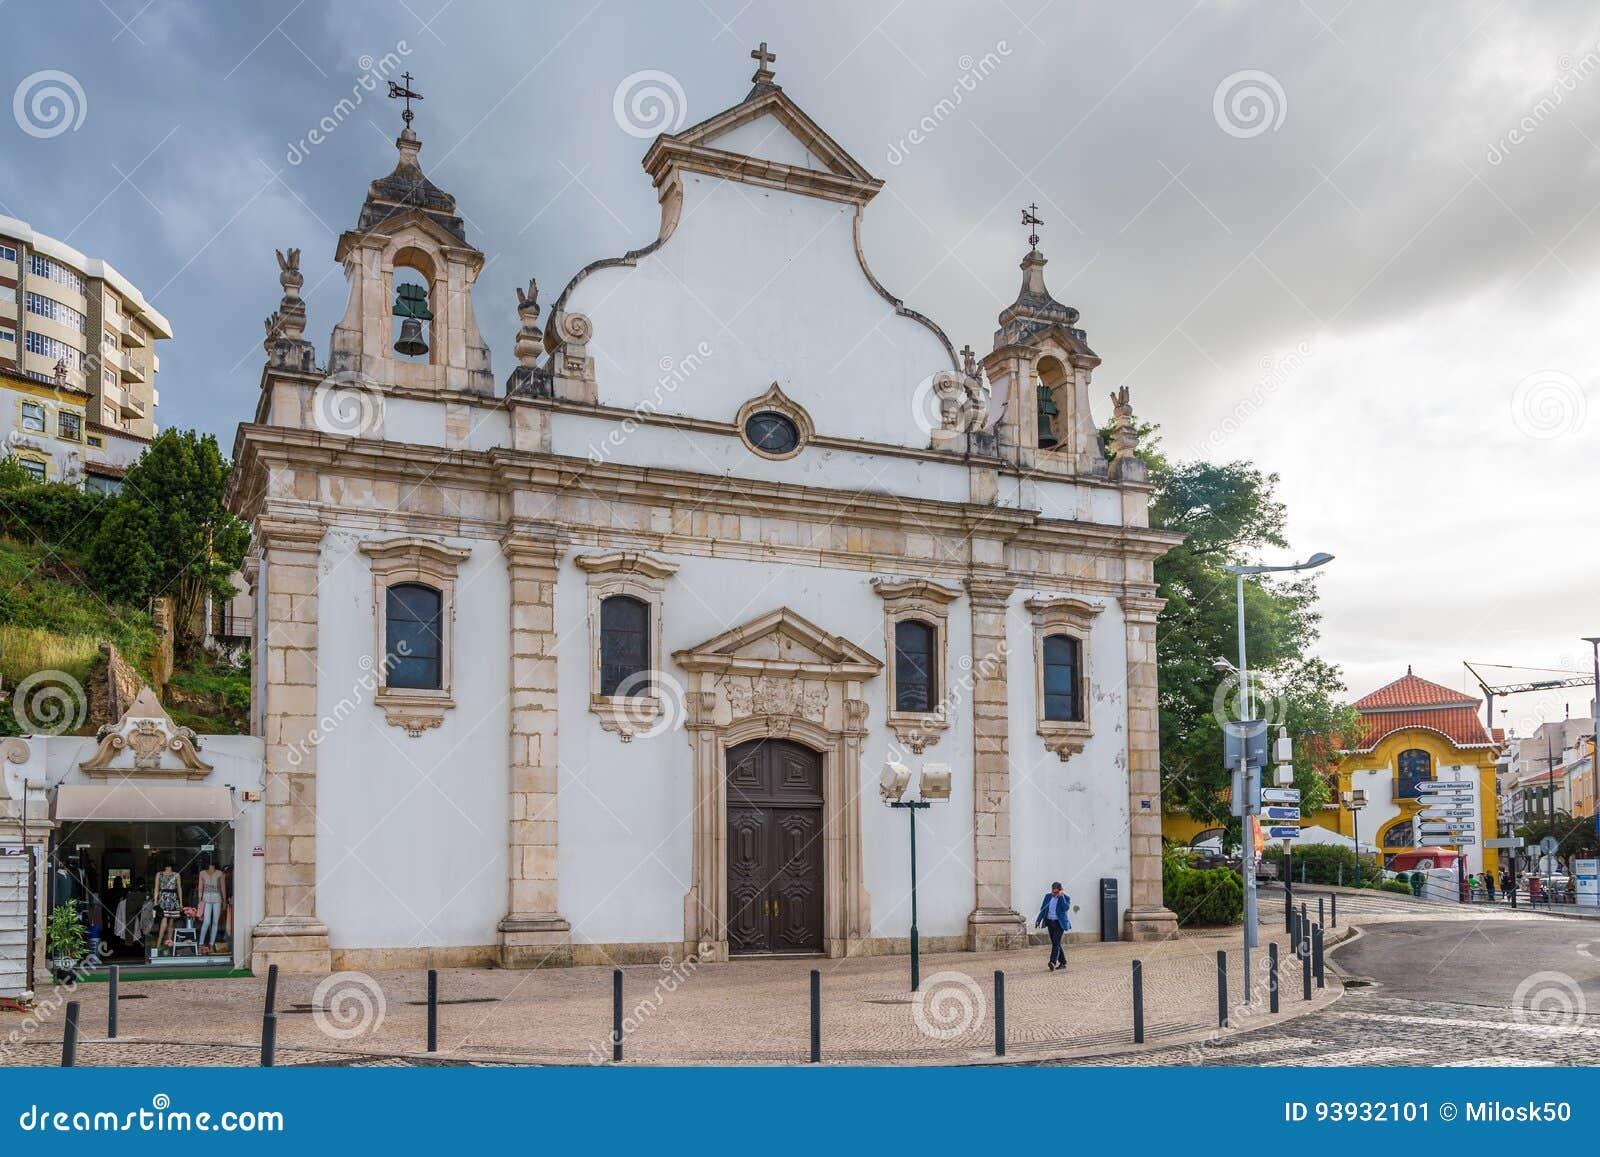 Ansicht an der Kirche von Espirito Santo in Leiria - Portugal